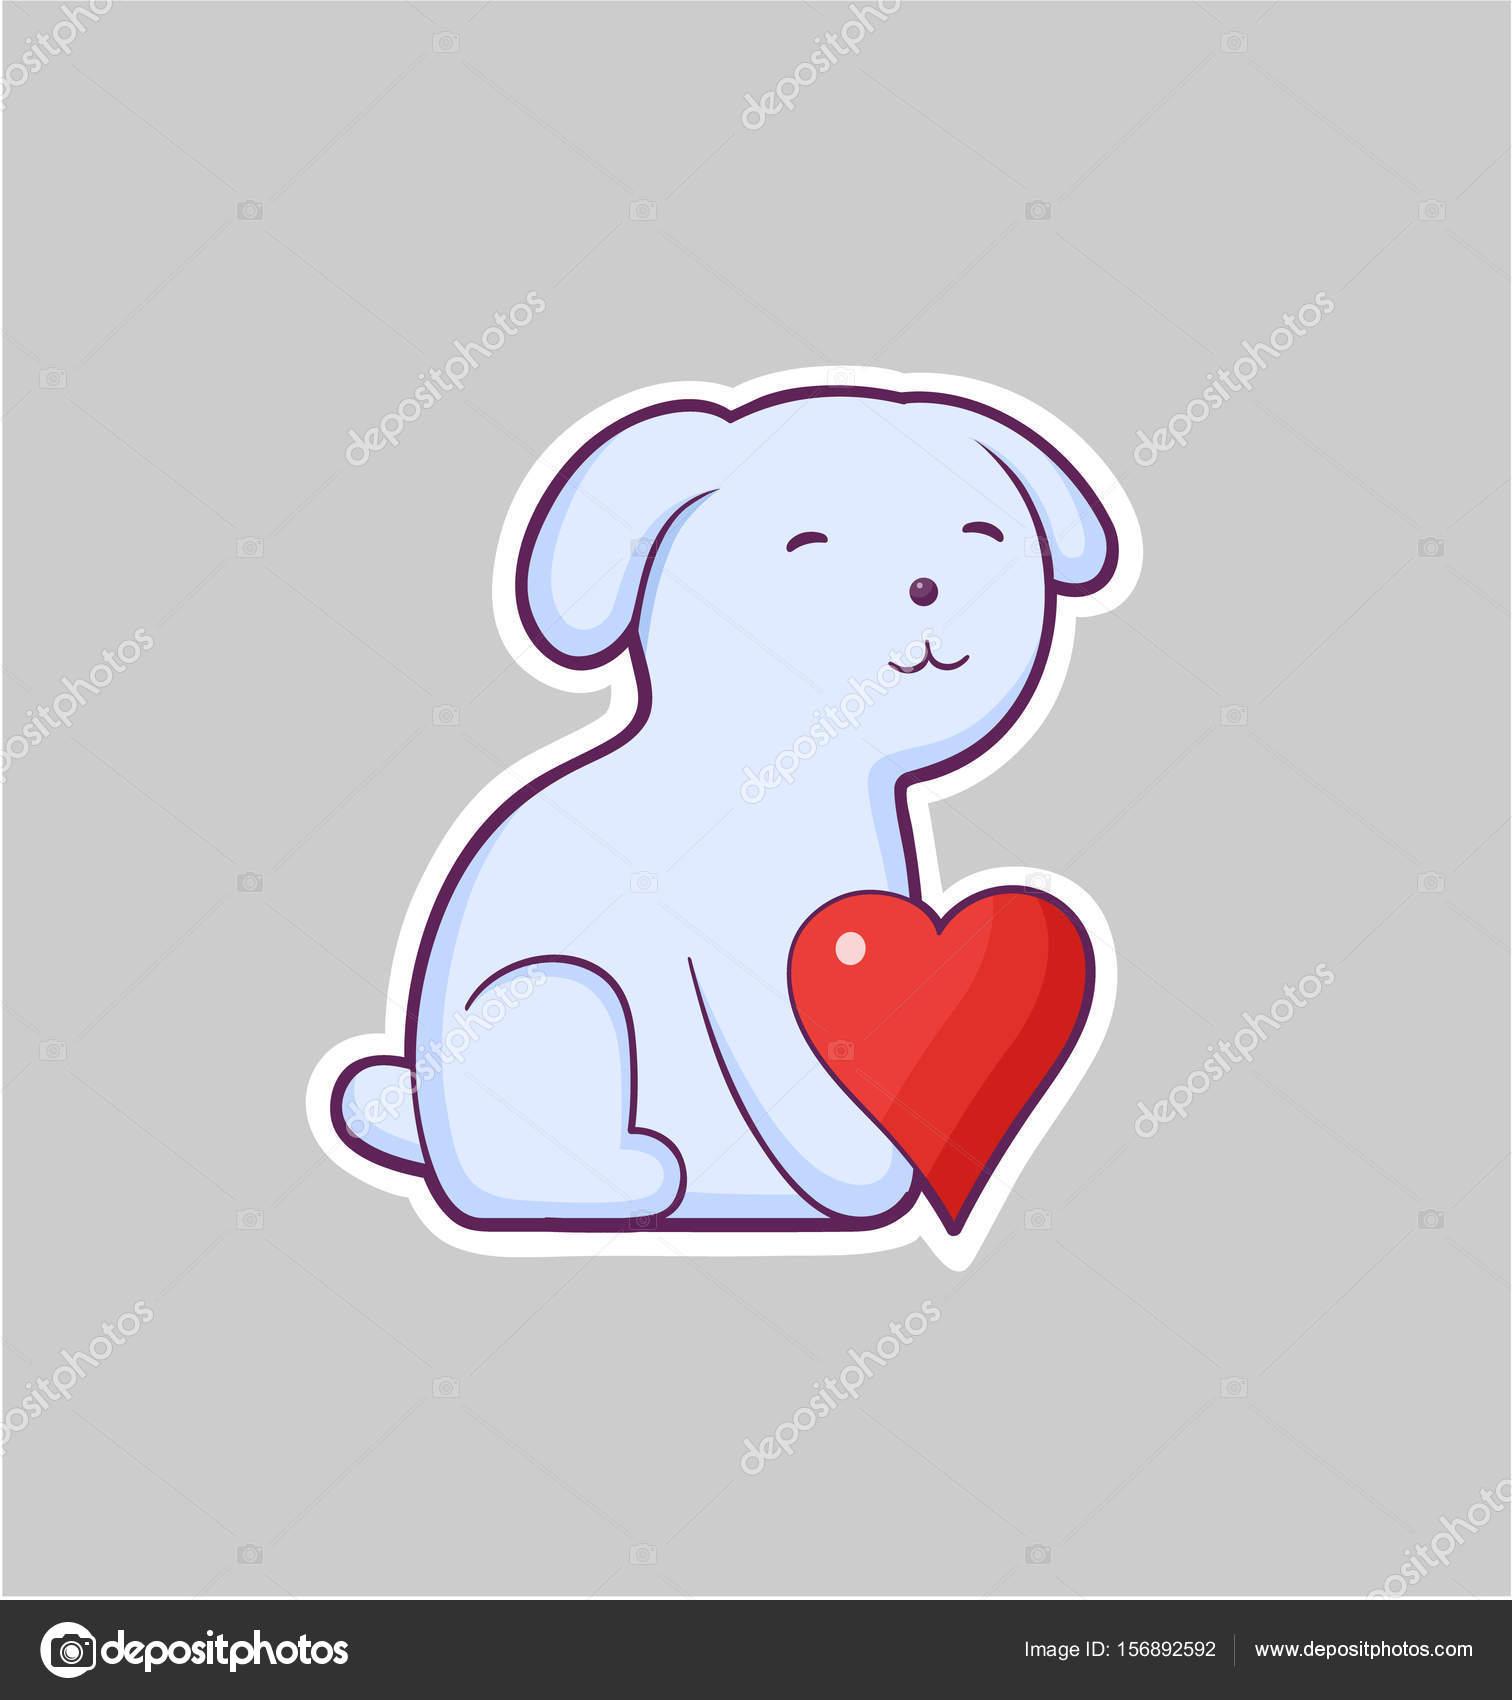 Dog giving heart